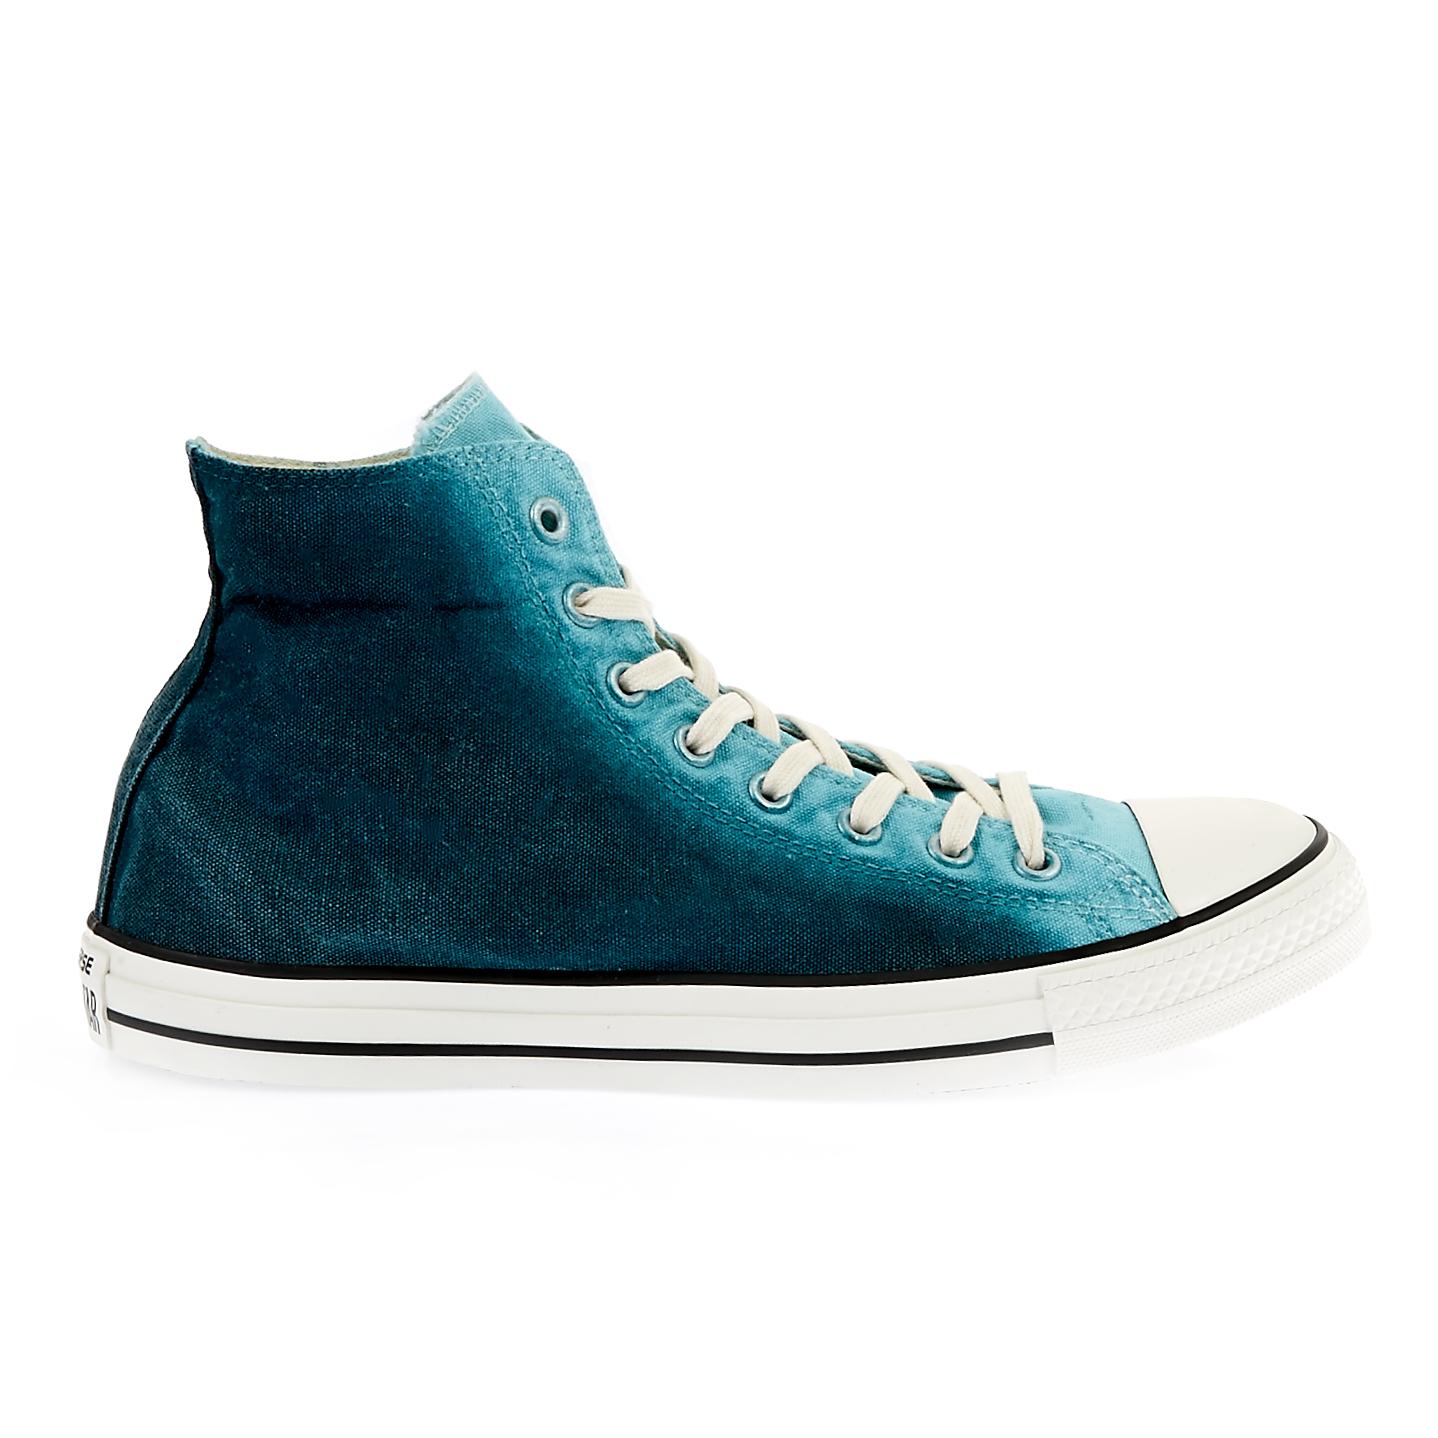 CONVERSE – Unisex παπούτσια Chuck Taylor All Star Hi μπλε-πράσινα